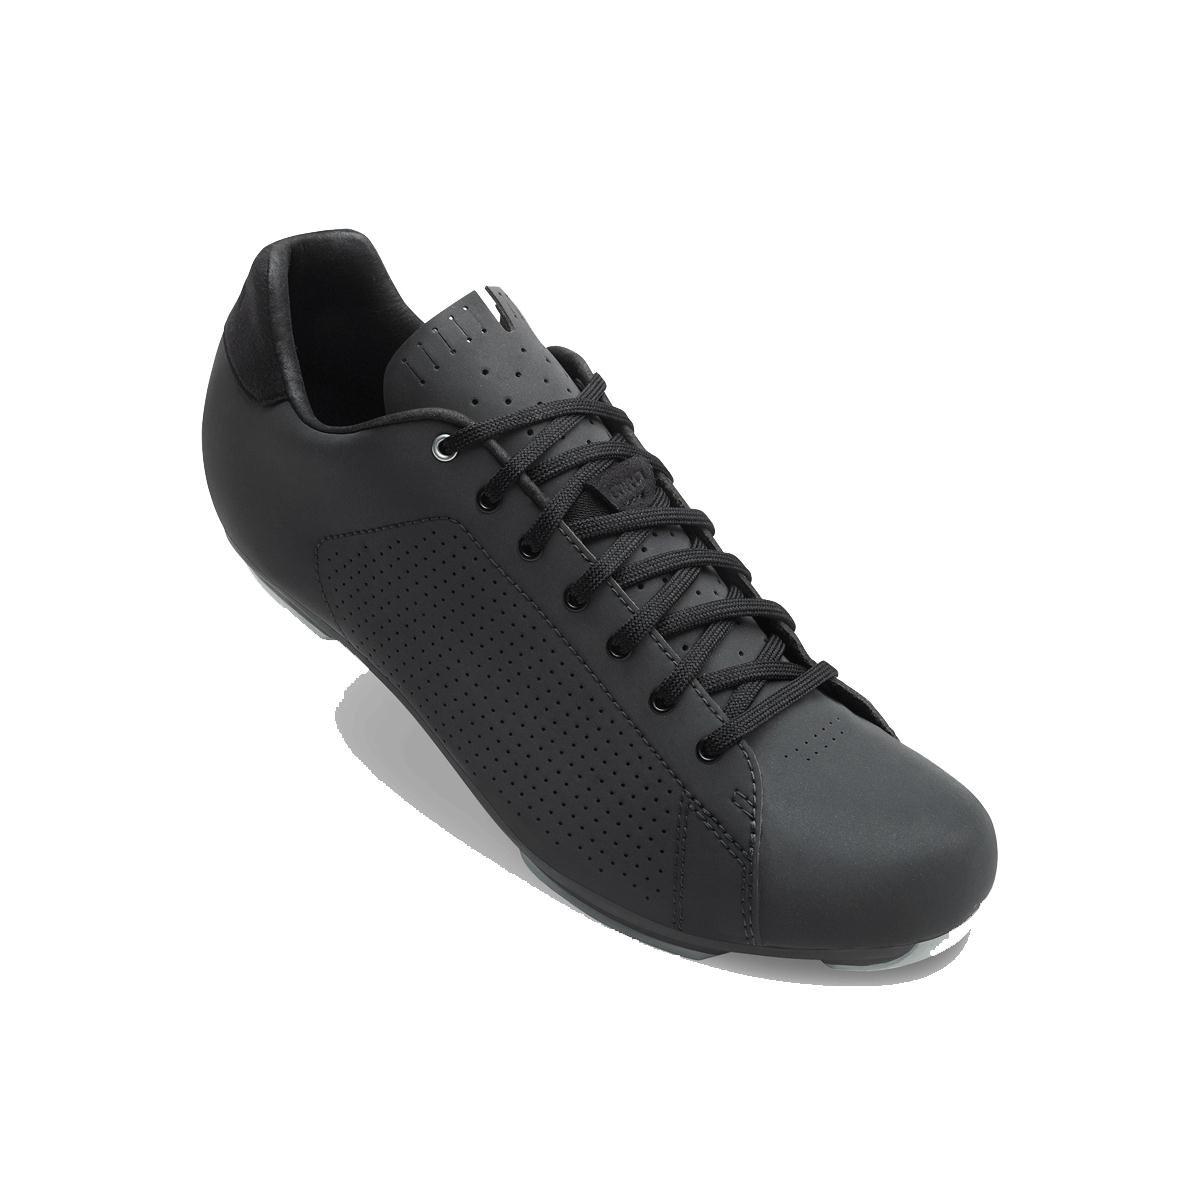 Giro Republic LX Reflective Cycling Shoes - Men's B075RP665S 46|Dark Shadow Reflective